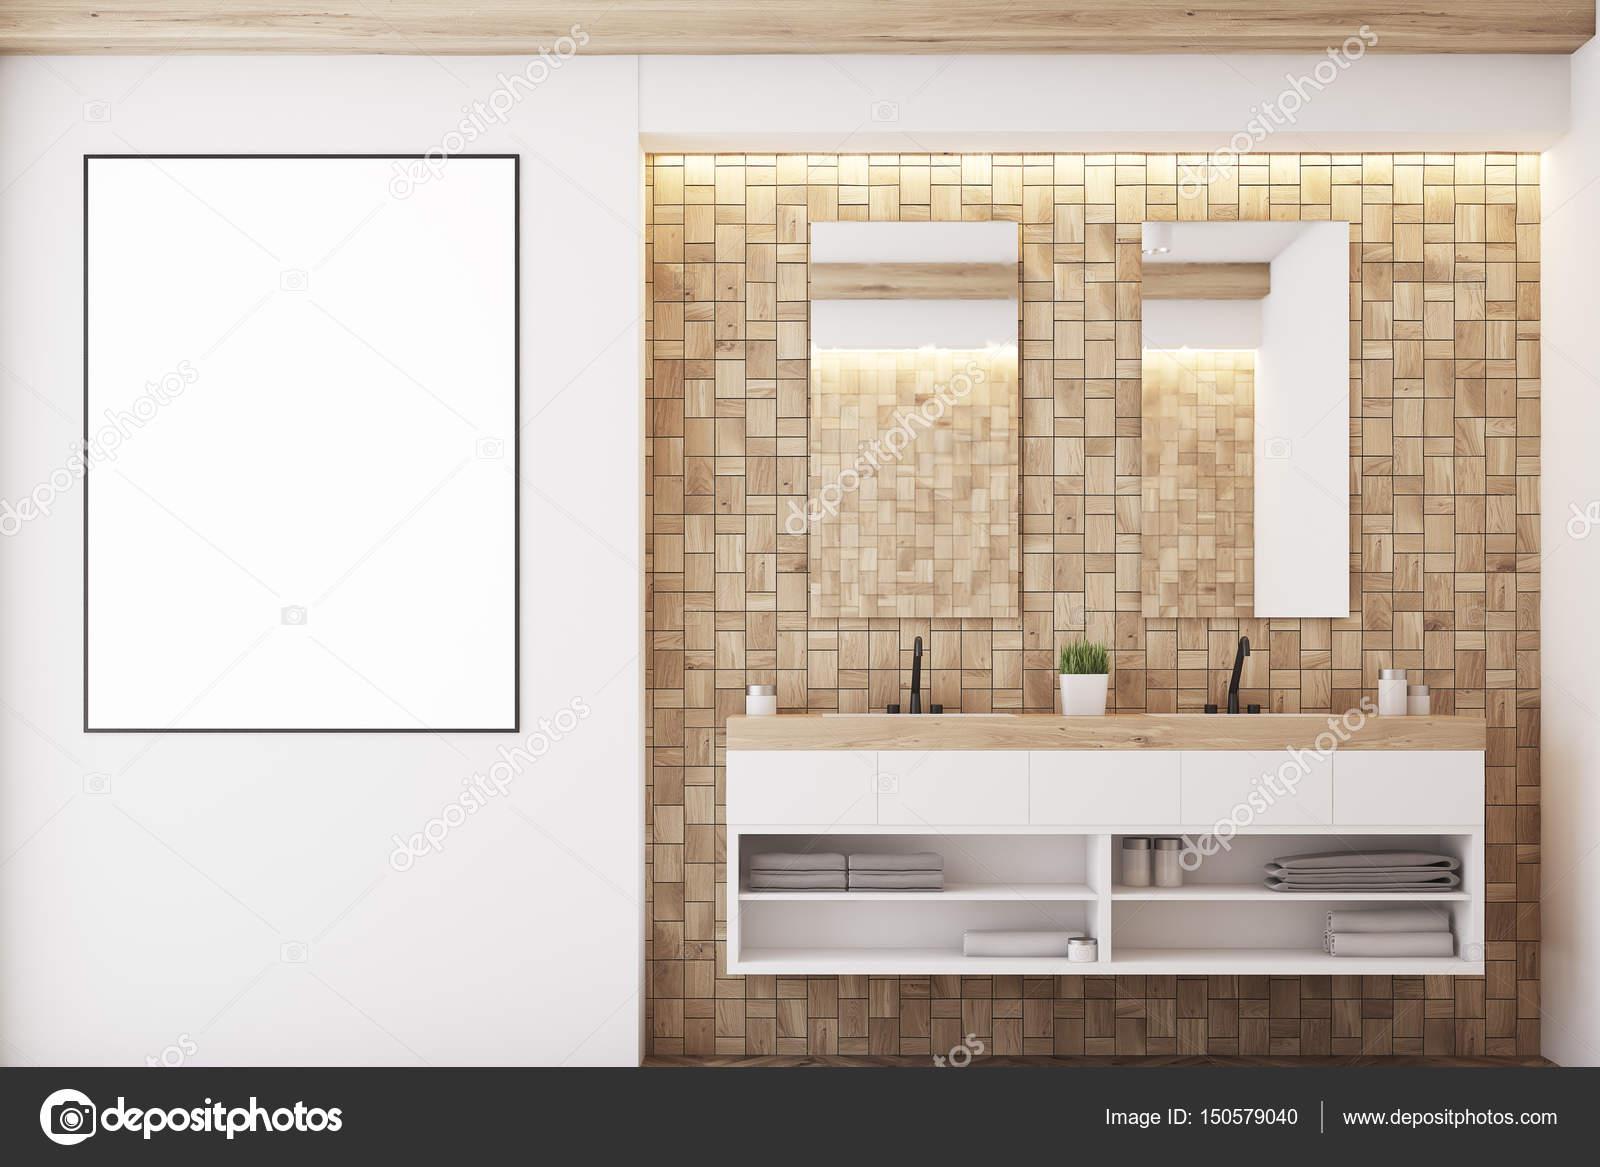 Badkamer Lichte Tegels : Tegels badkamer licht zinken u2014 stockfoto © denisismagilov #150579040